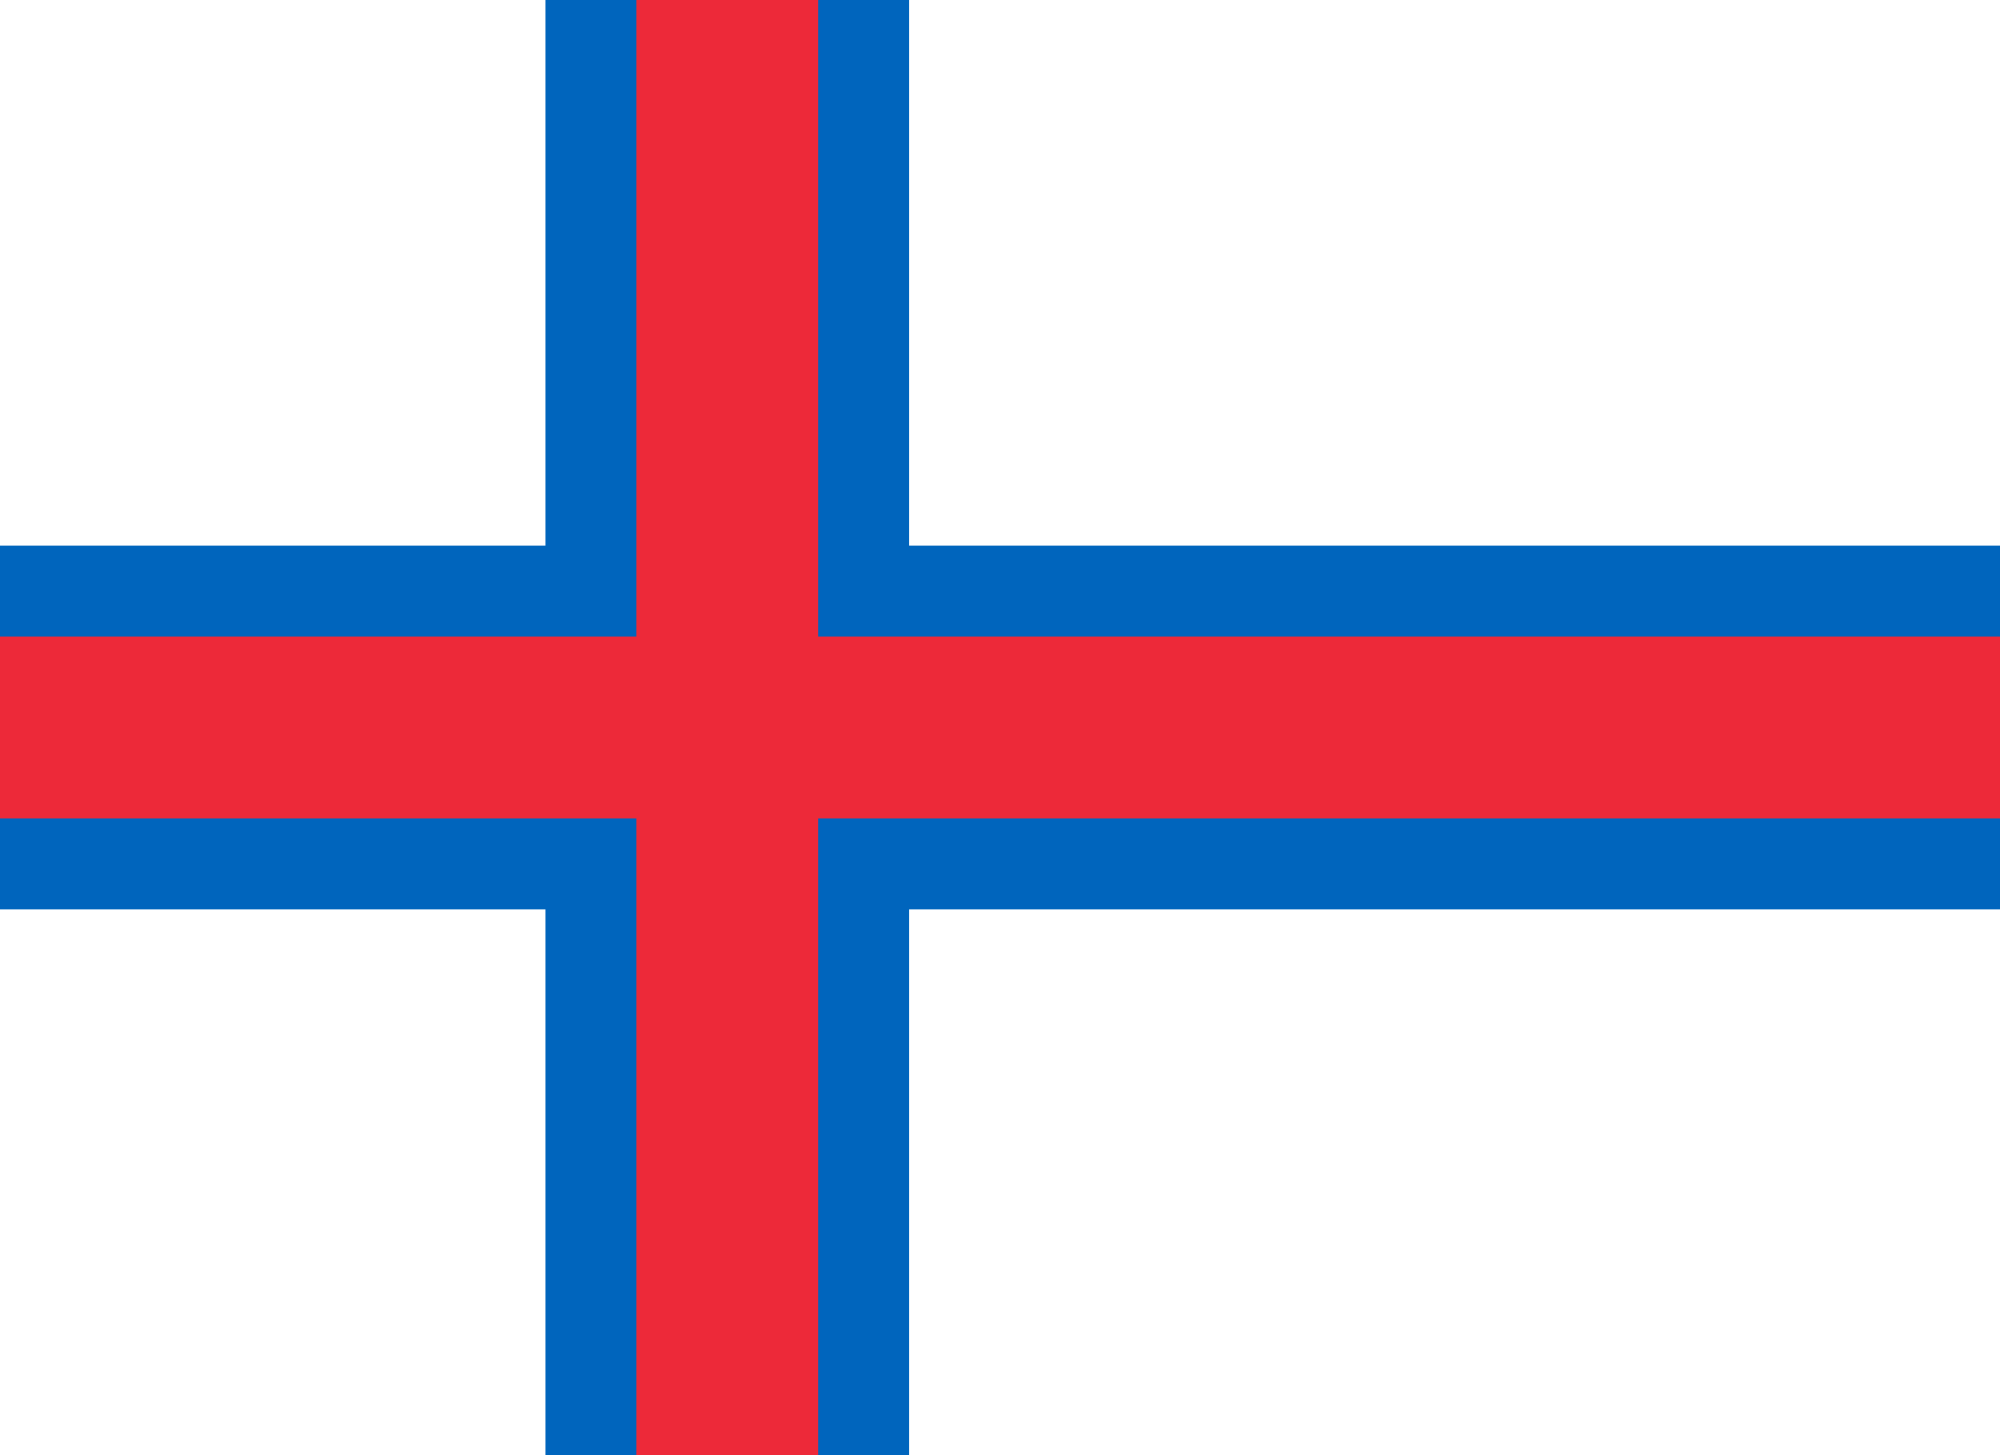 islas feroe, χώρα, έμβλημα, λογότυπο, σύμβολο - Wallpapers HD - Professor-falken.com